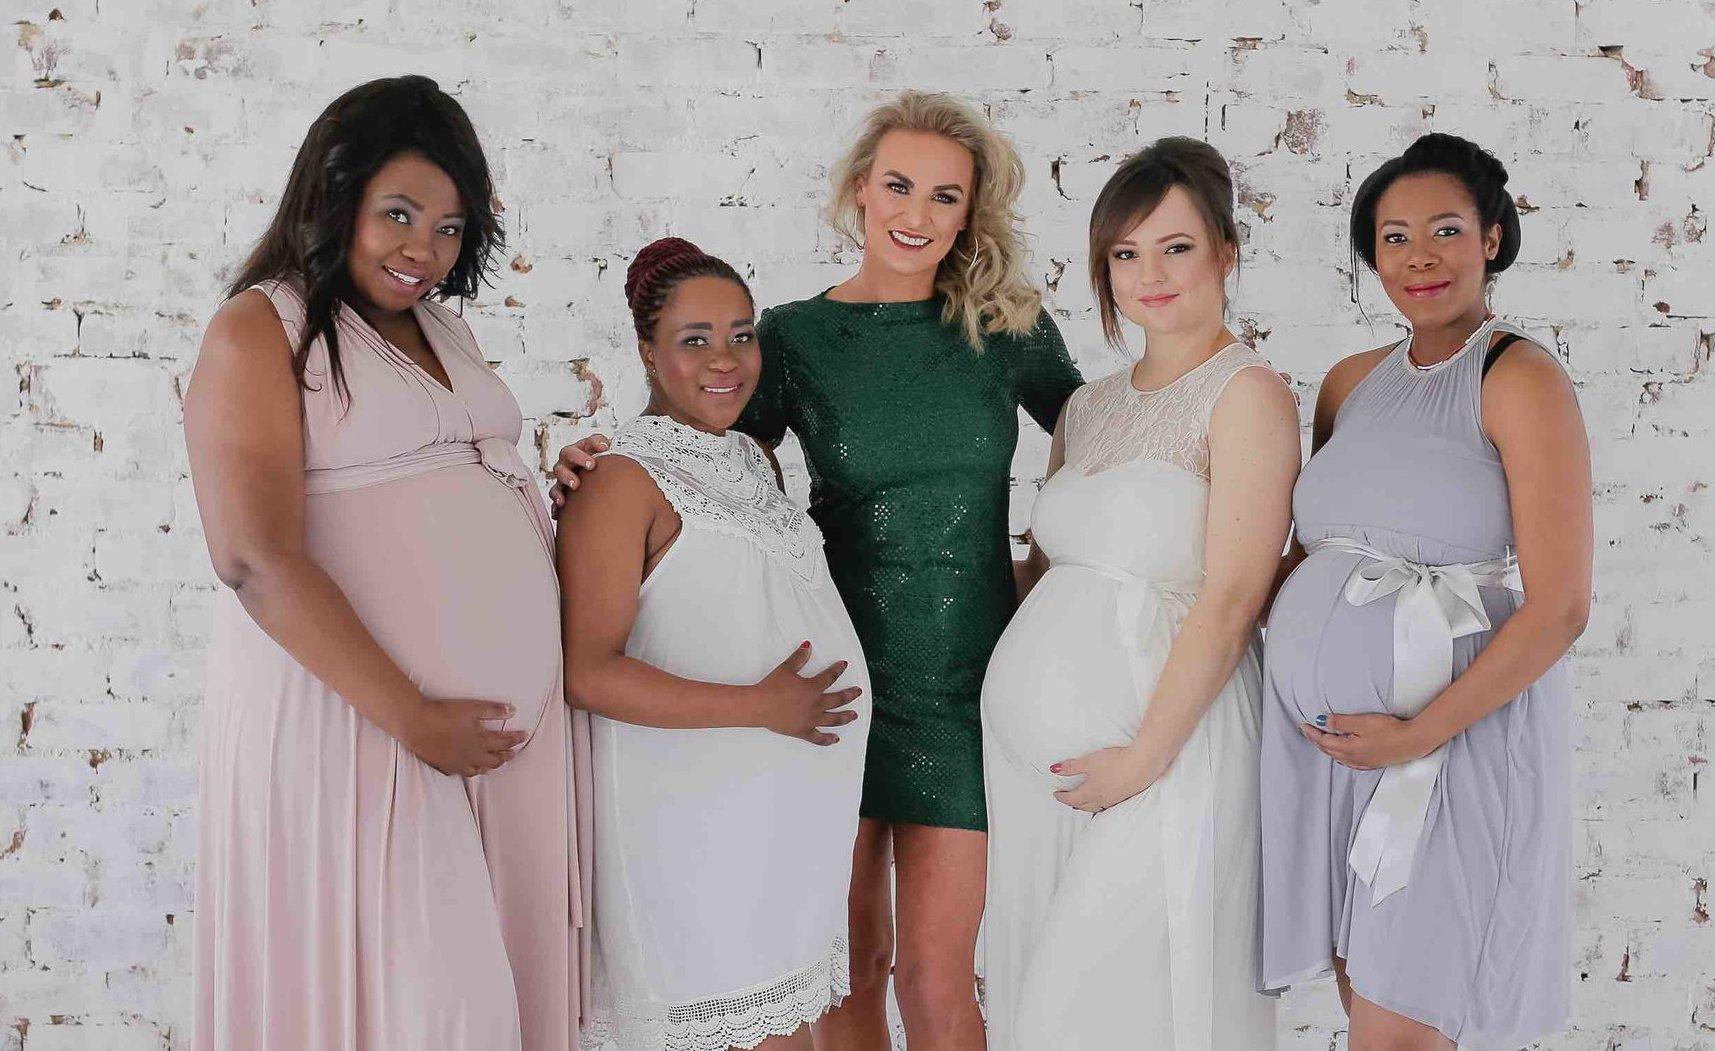 My Pregnancy Journey App for Africa's women